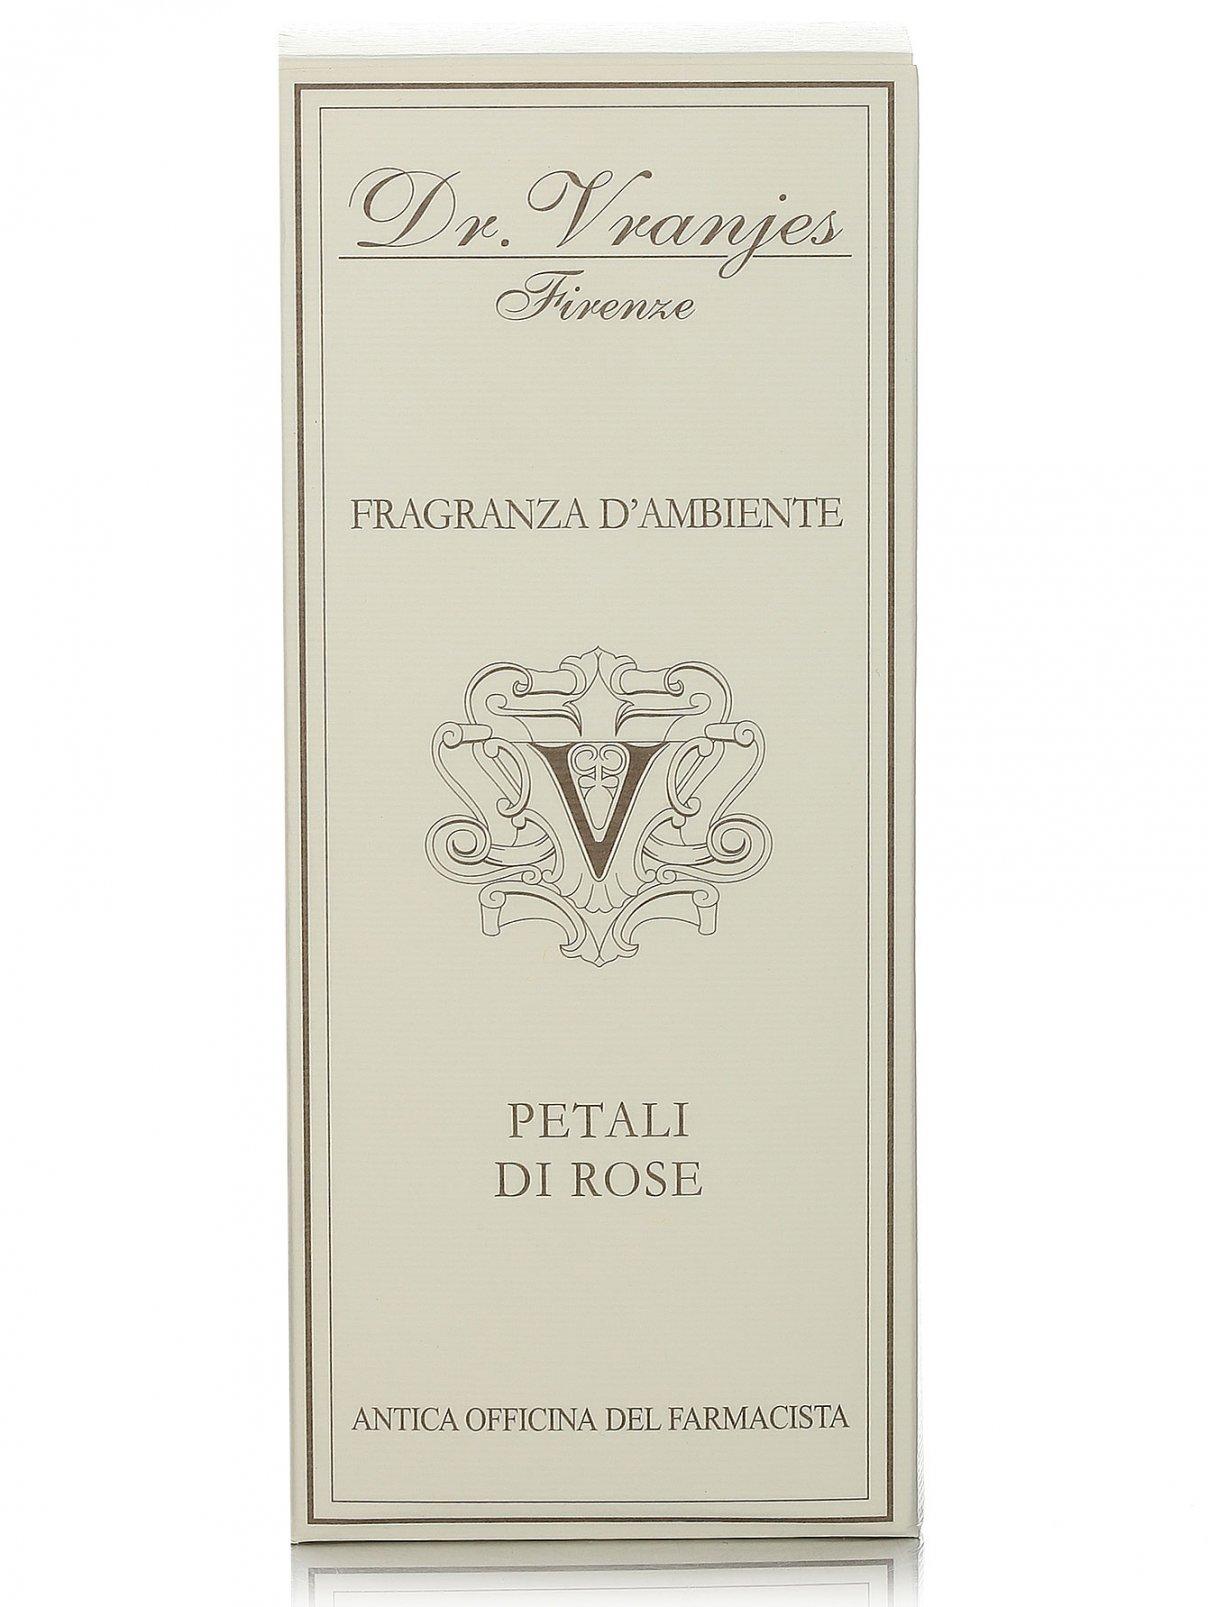 Ароматизатор воздуха Petali Di Rose - Home Fragrance, 250ml Dr. Vranjes  –  Модель Общий вид